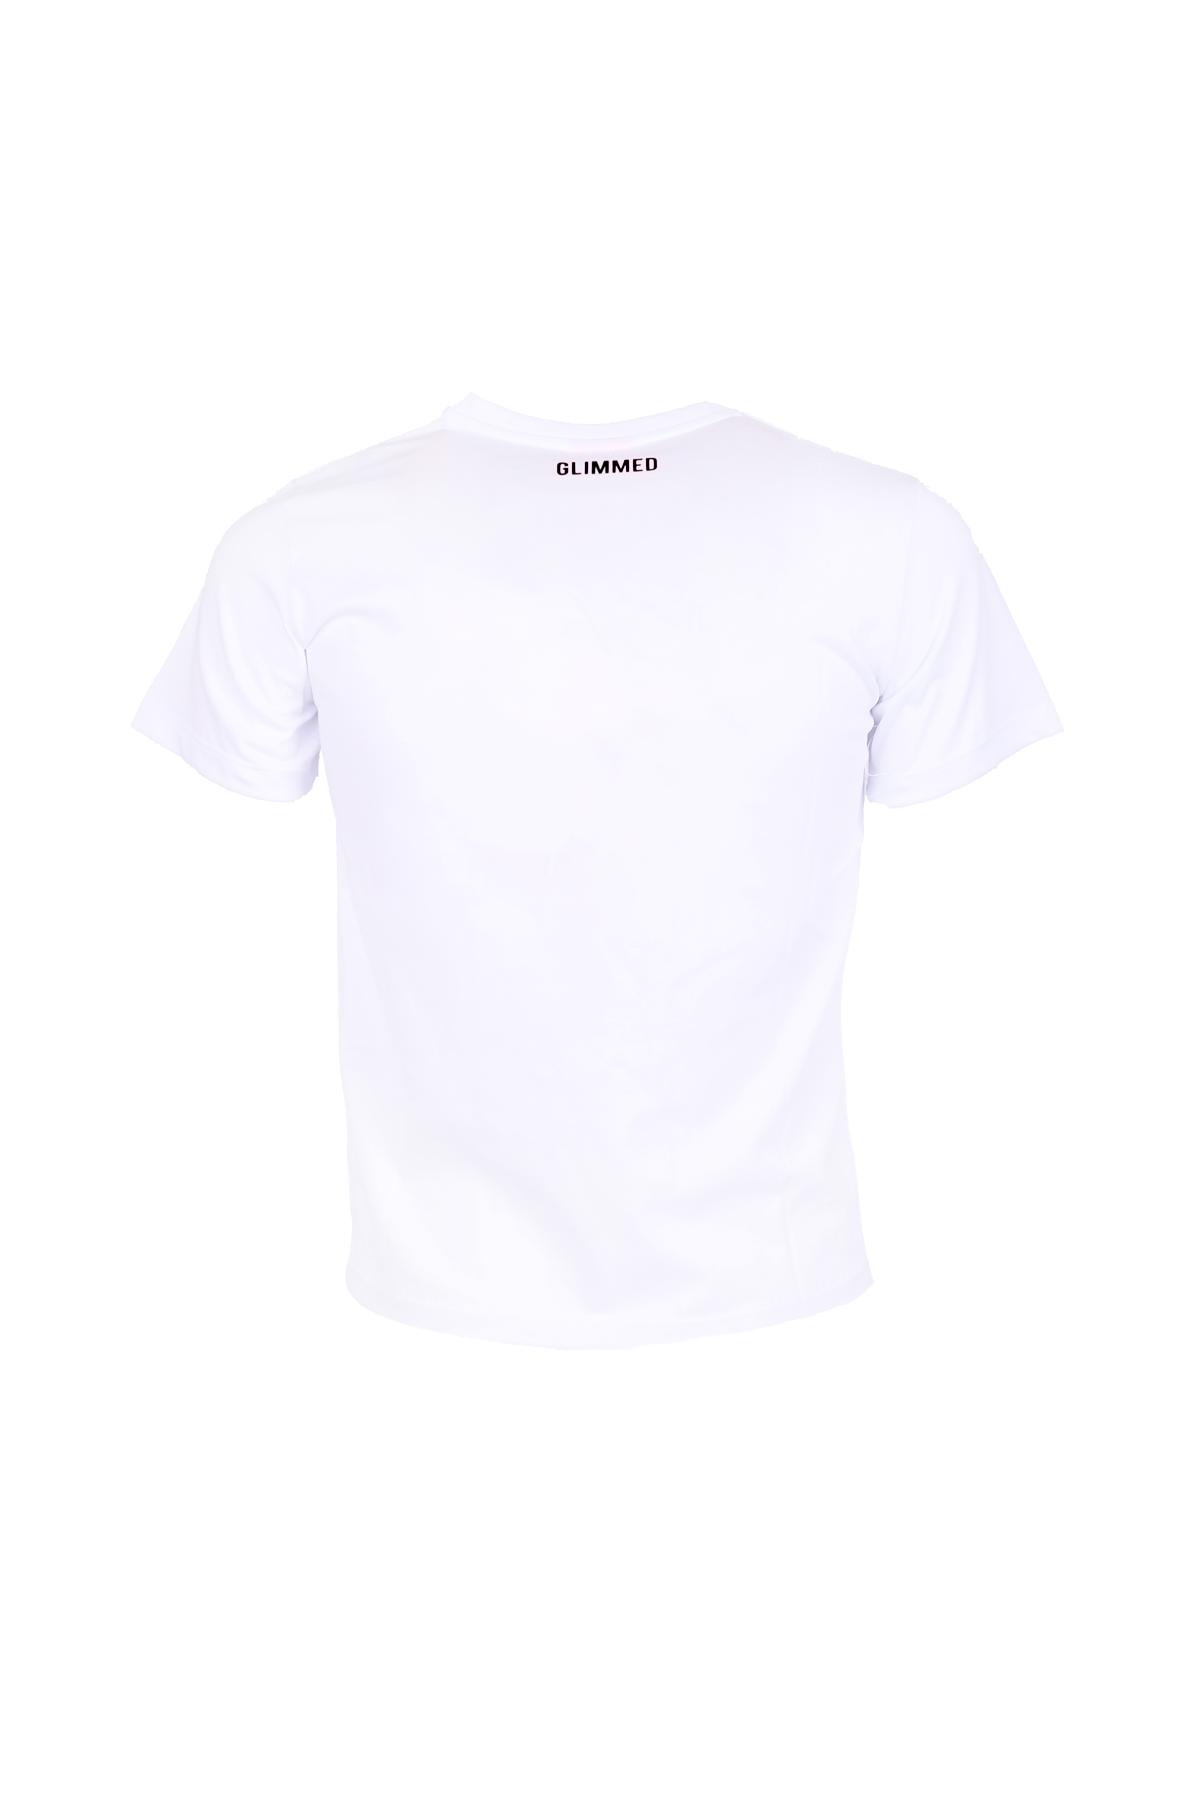 COTTON T-SHIRT GLIMMED | T-shirt | CCW190100101BIANCO